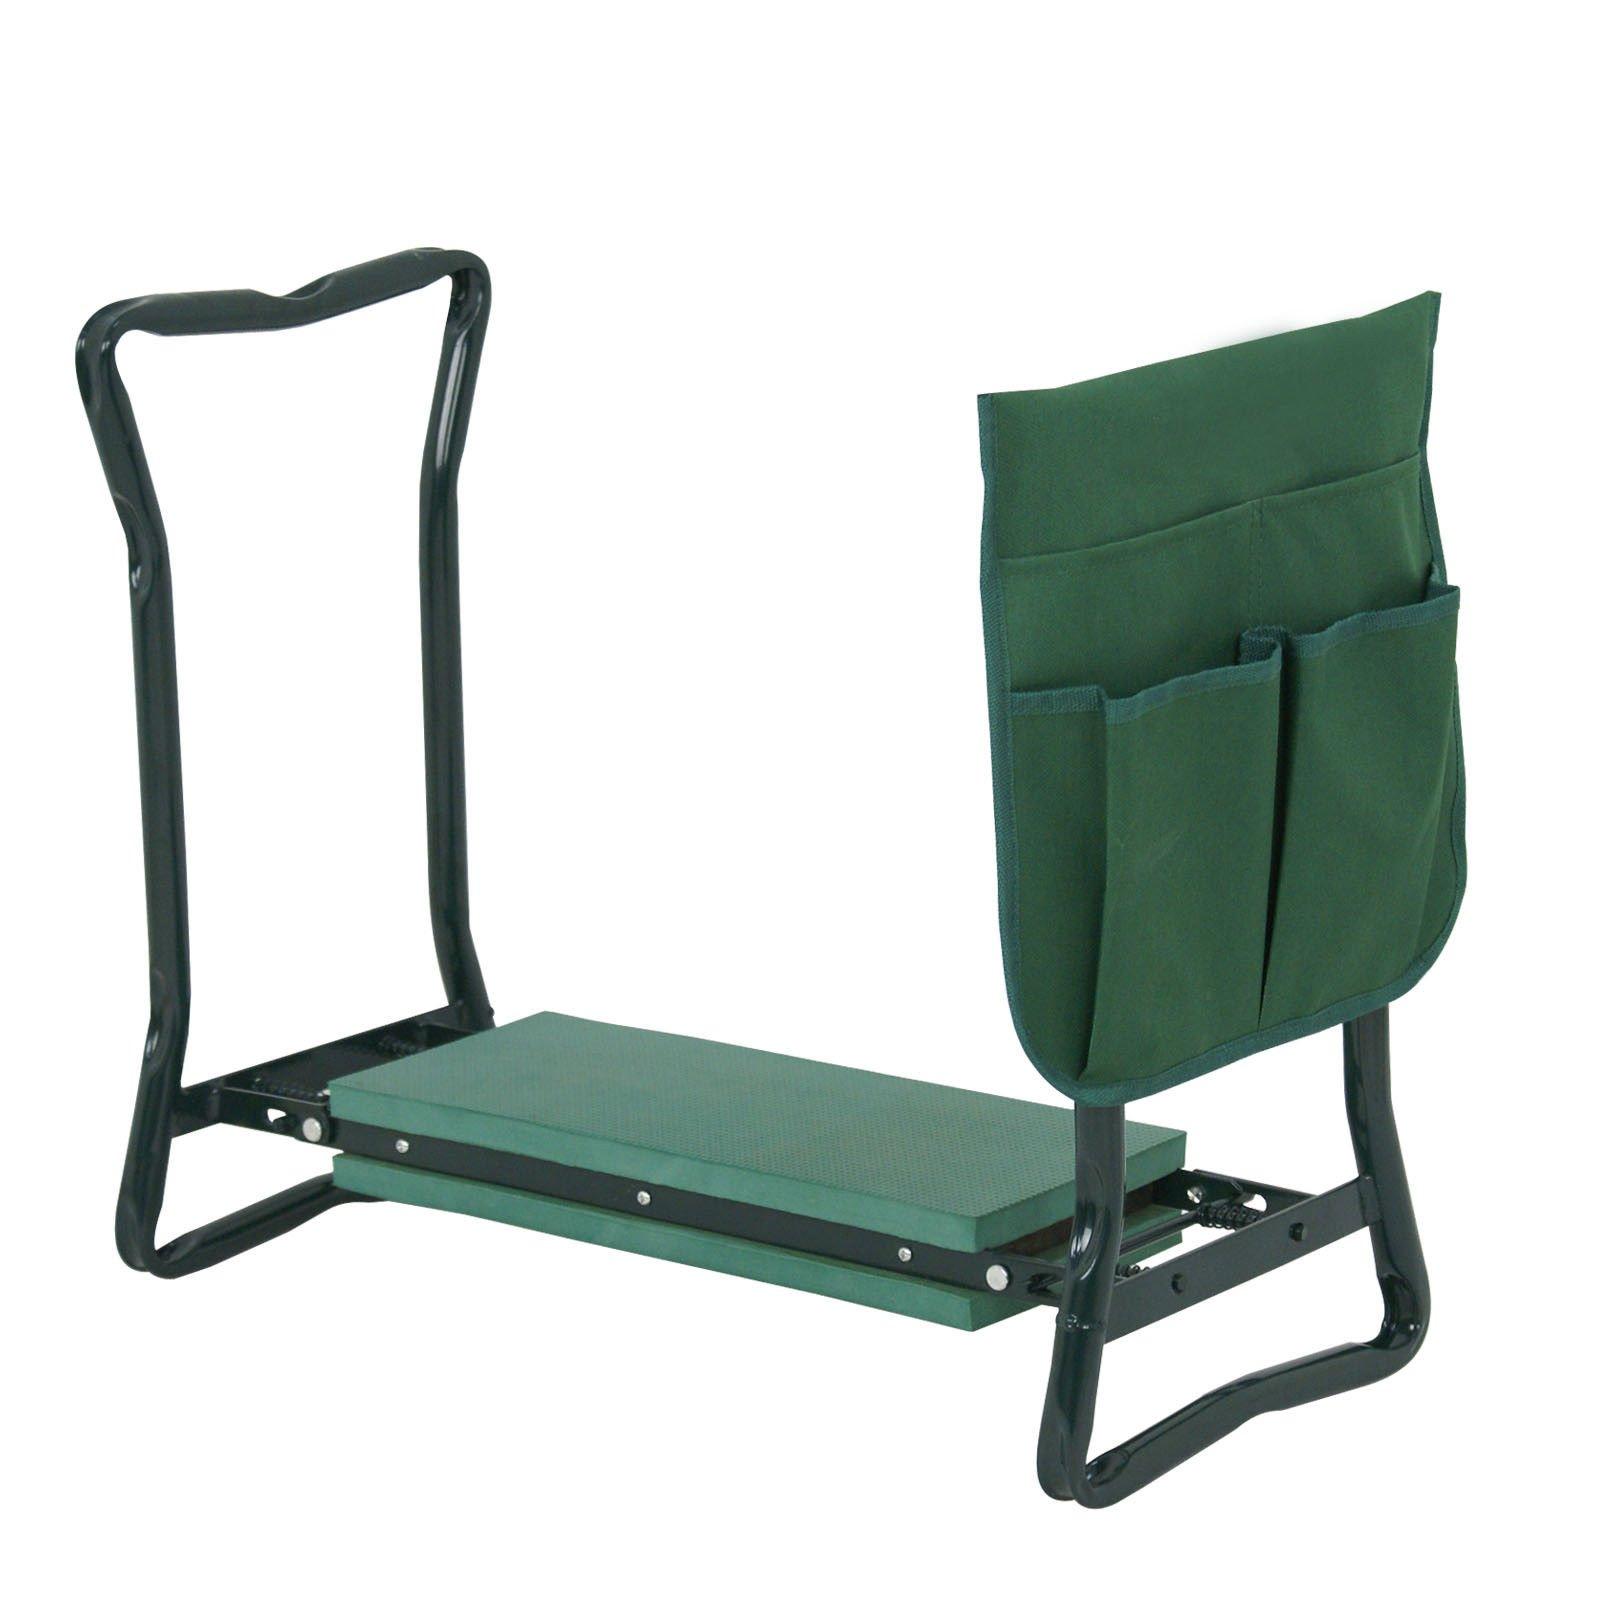 KornKan Folding Garden Kneeler Sturdy Gardener Kneeling Pad Seat Kneel Pad Seat Cushion by KornKan